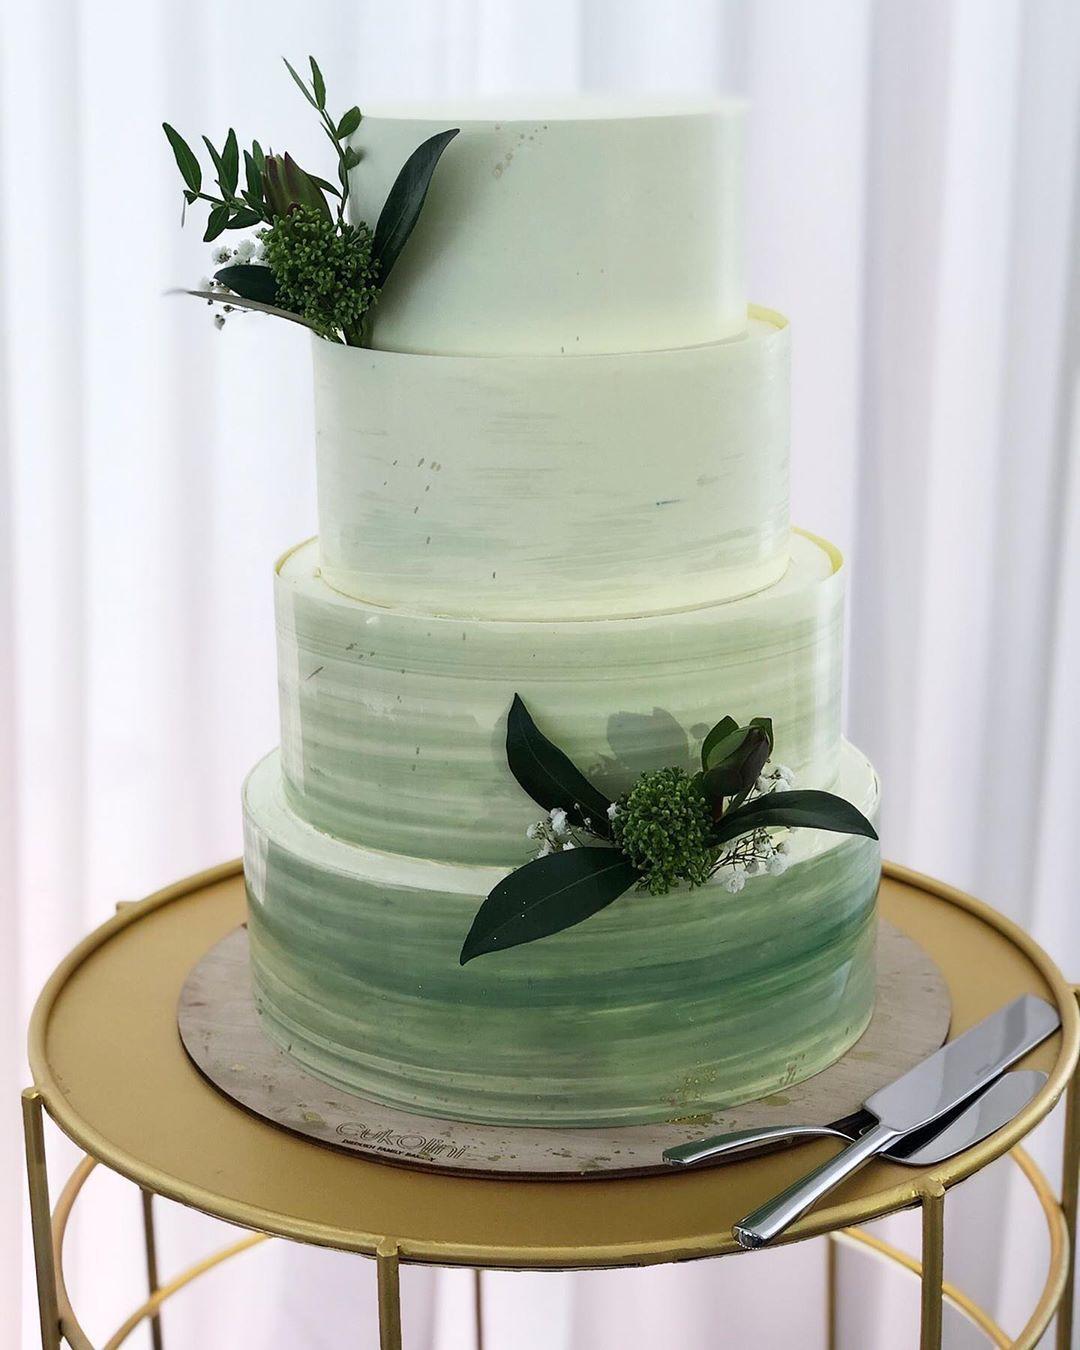 "Світлана on Instagram: ""@cukolini.bakery #cukolini #weddingcake #cakewedding #cakelover #cakeart #cakegram #frenchcake #весіллярівне #кендібаррівне"""